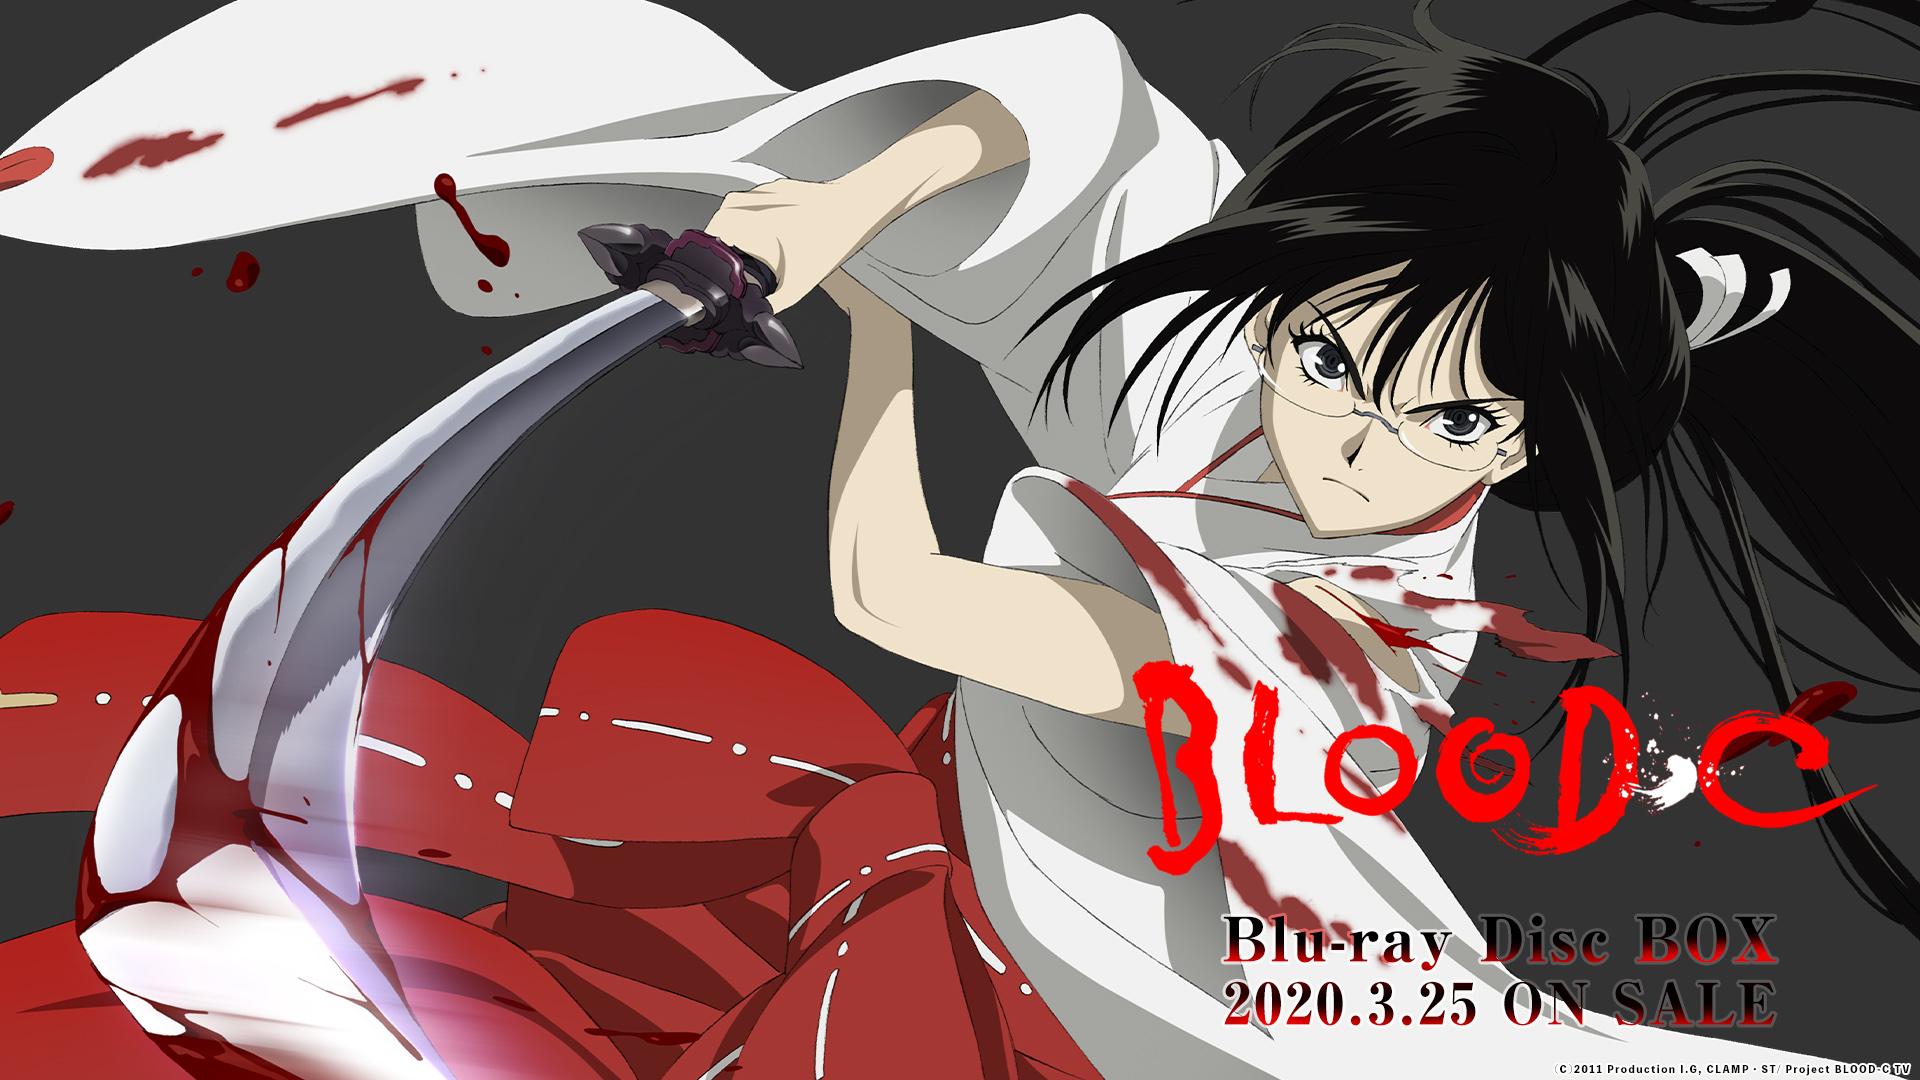 Blood Blu Ray Disc Box特設サイト